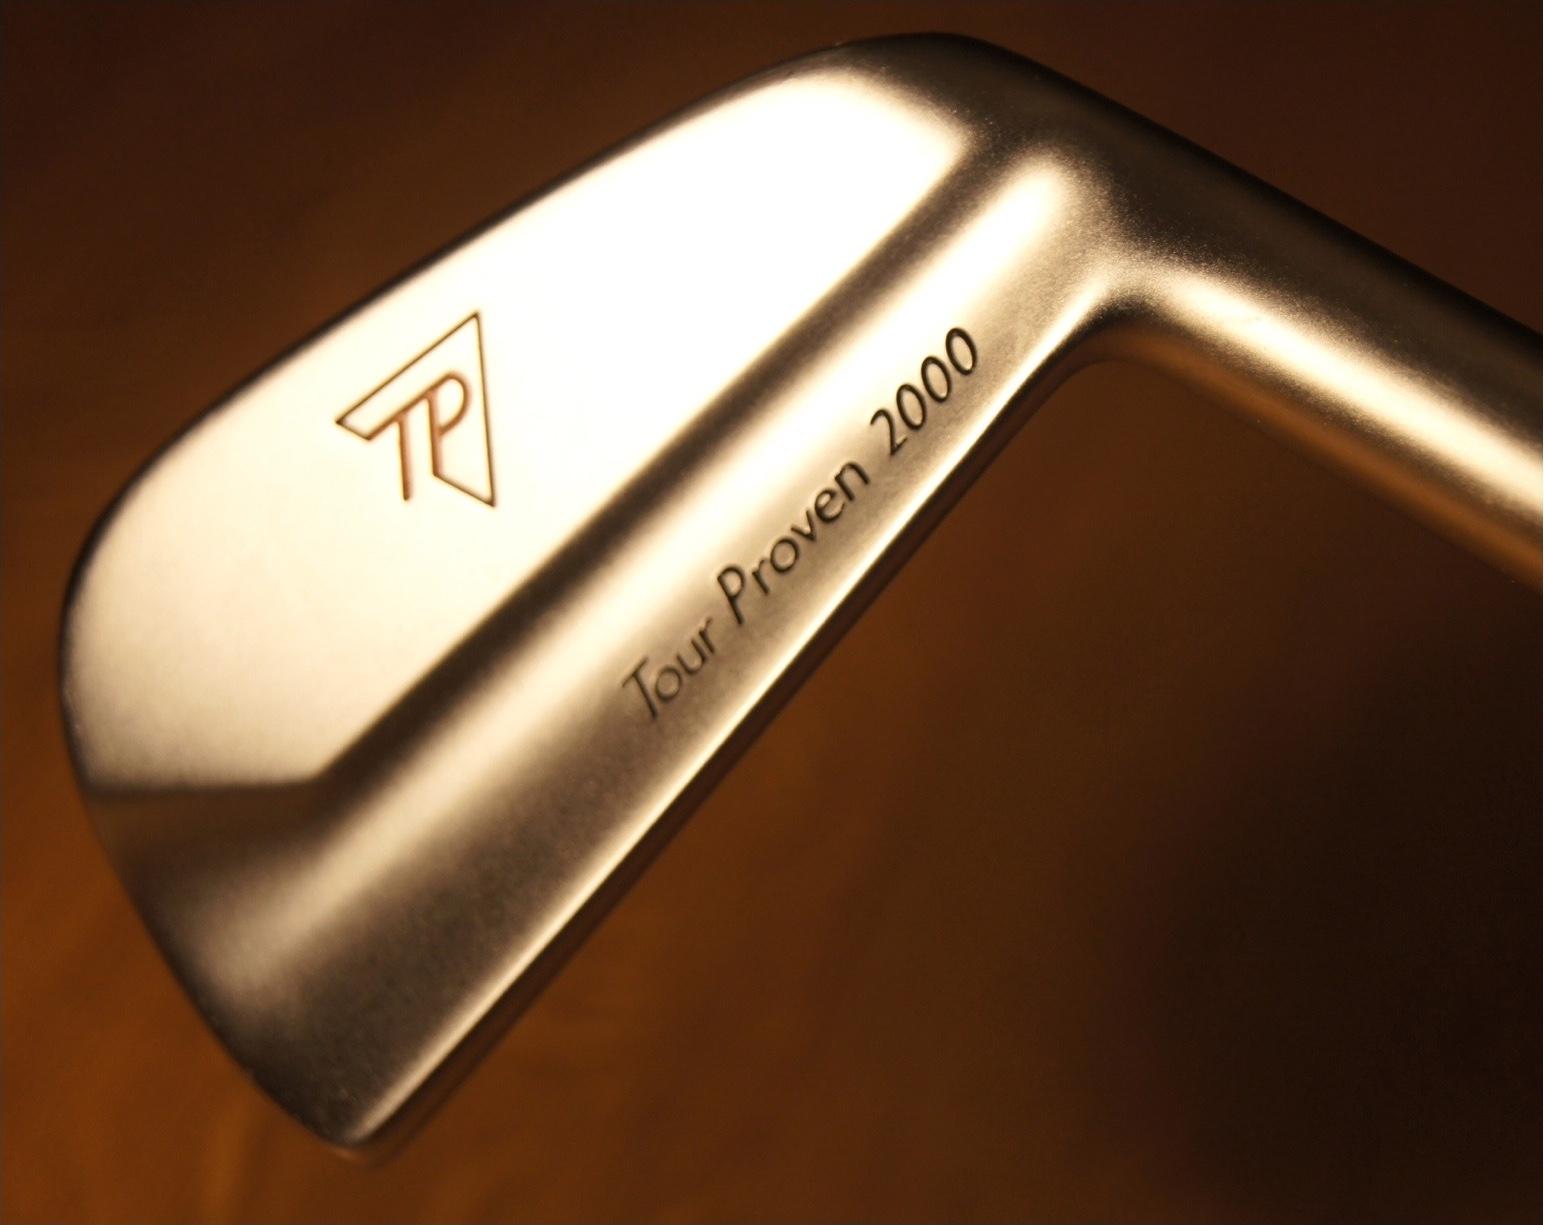 Mizuno TP-2000 Golf Club